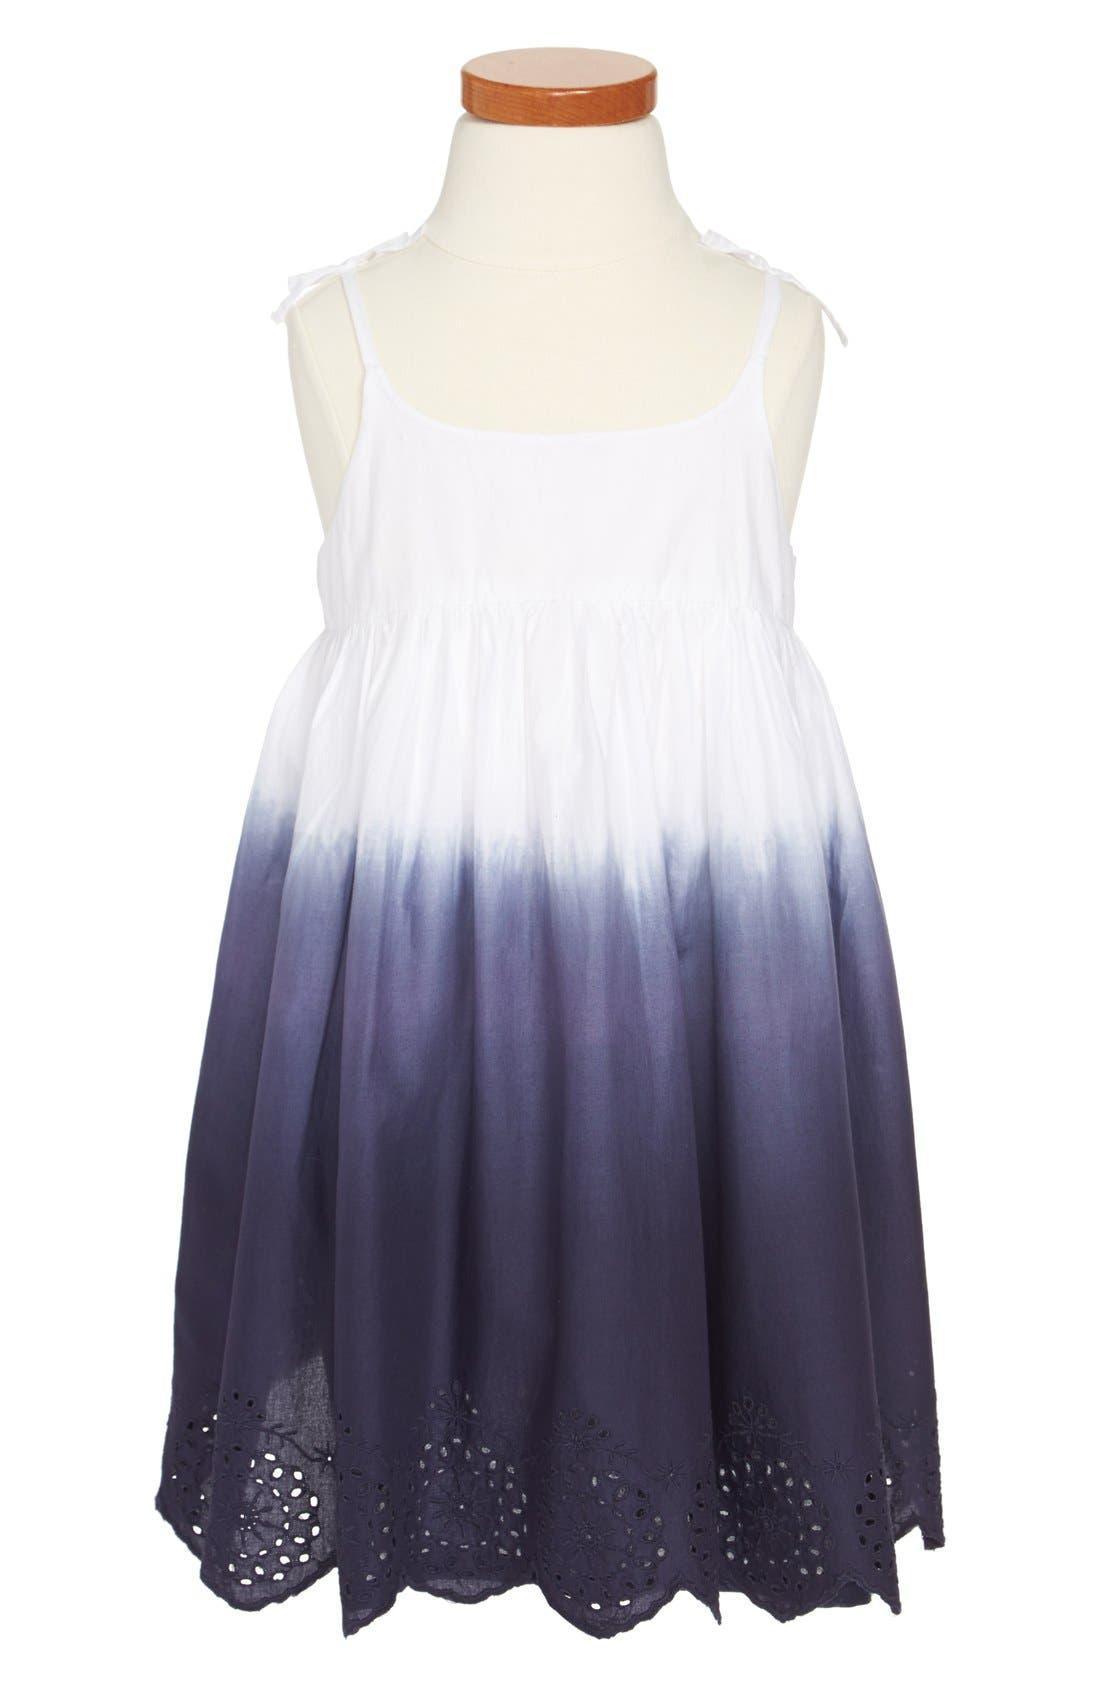 Alternate Image 1 Selected - Tucker + Tate 'Maya' Sleeveless Dress (Toddler Girls, Little Girls & Big Girls)